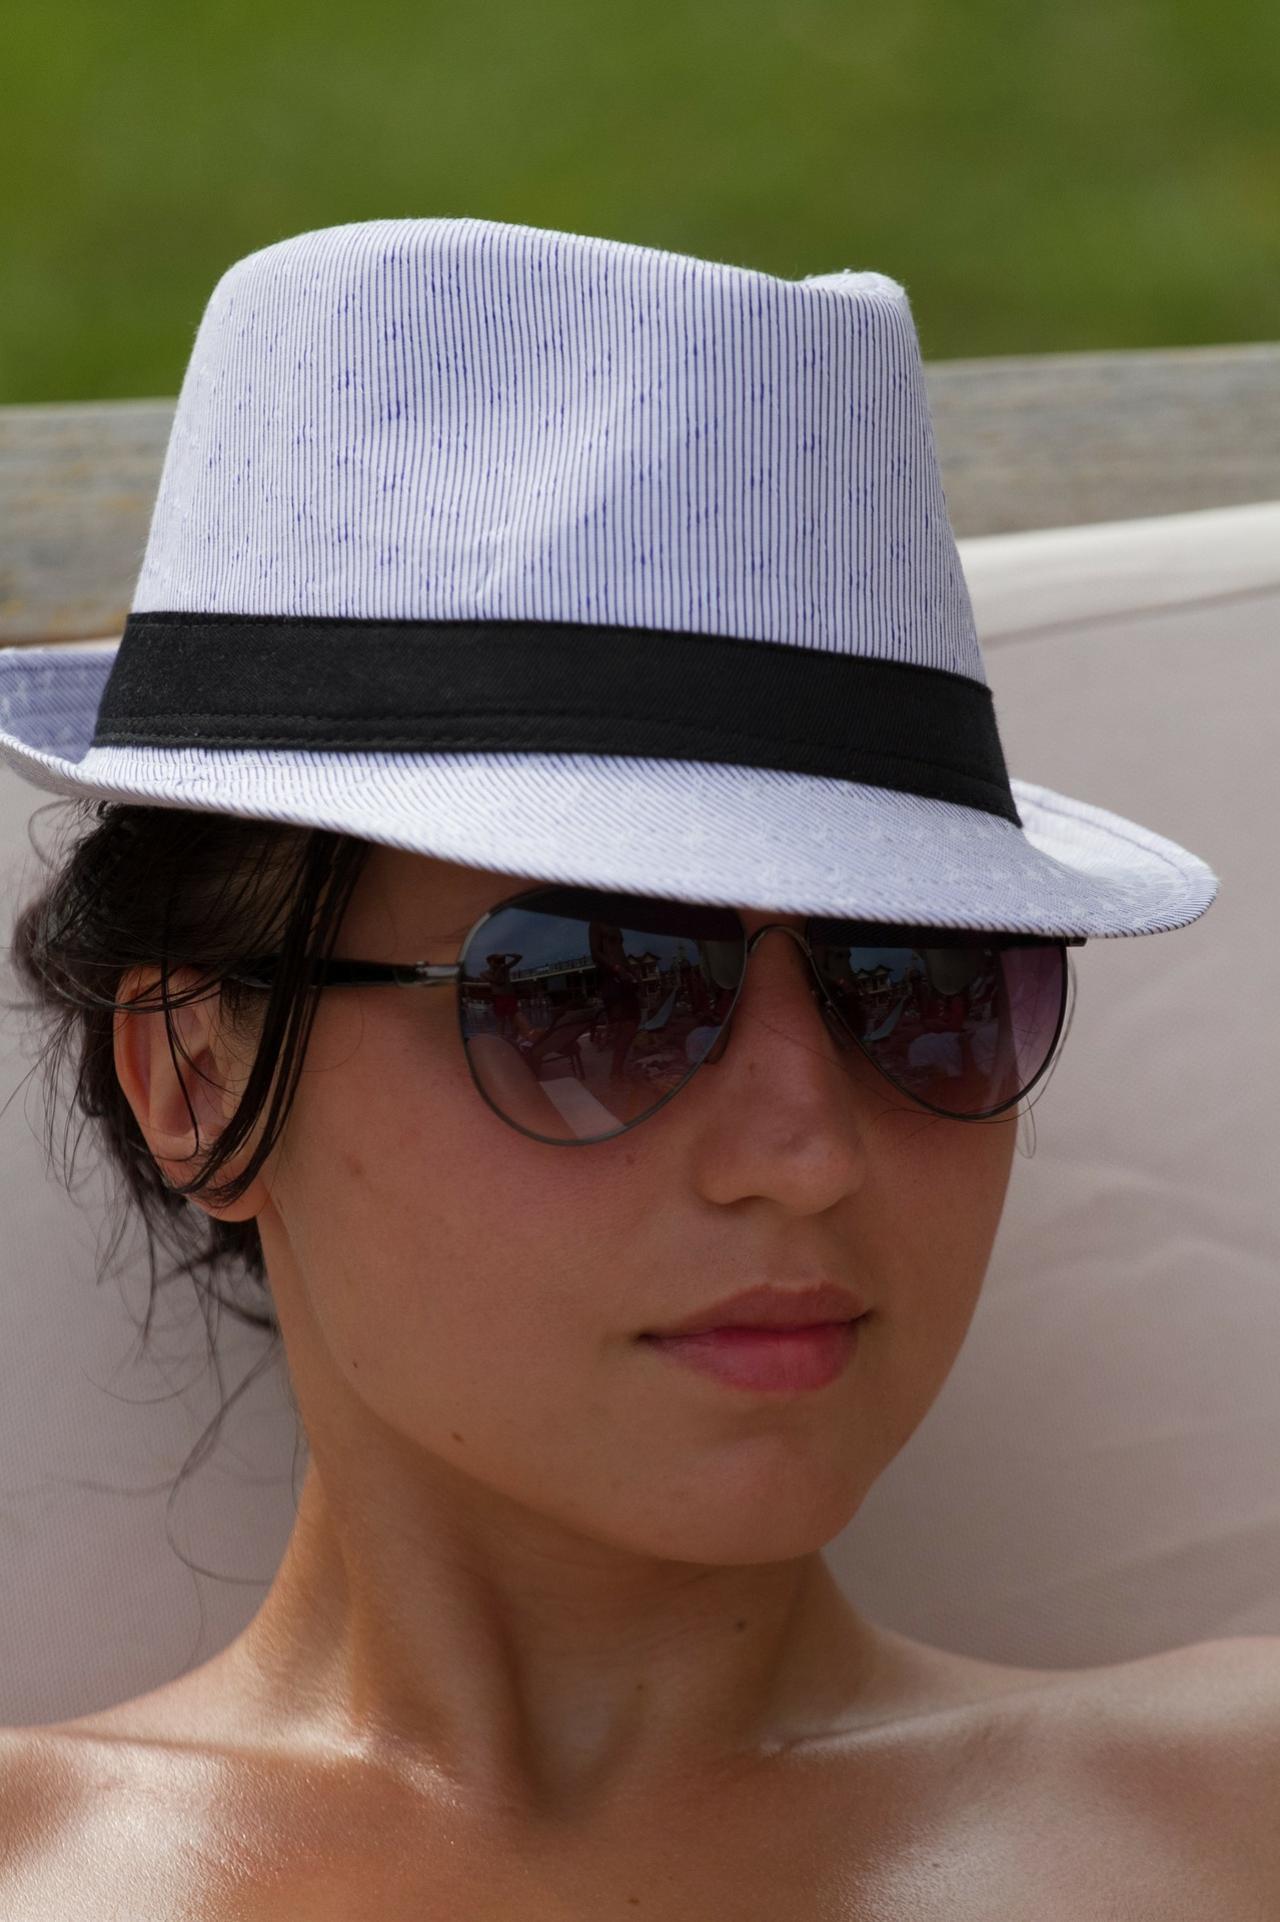 76db1af91bf06 mujer sombrero panama.jpg